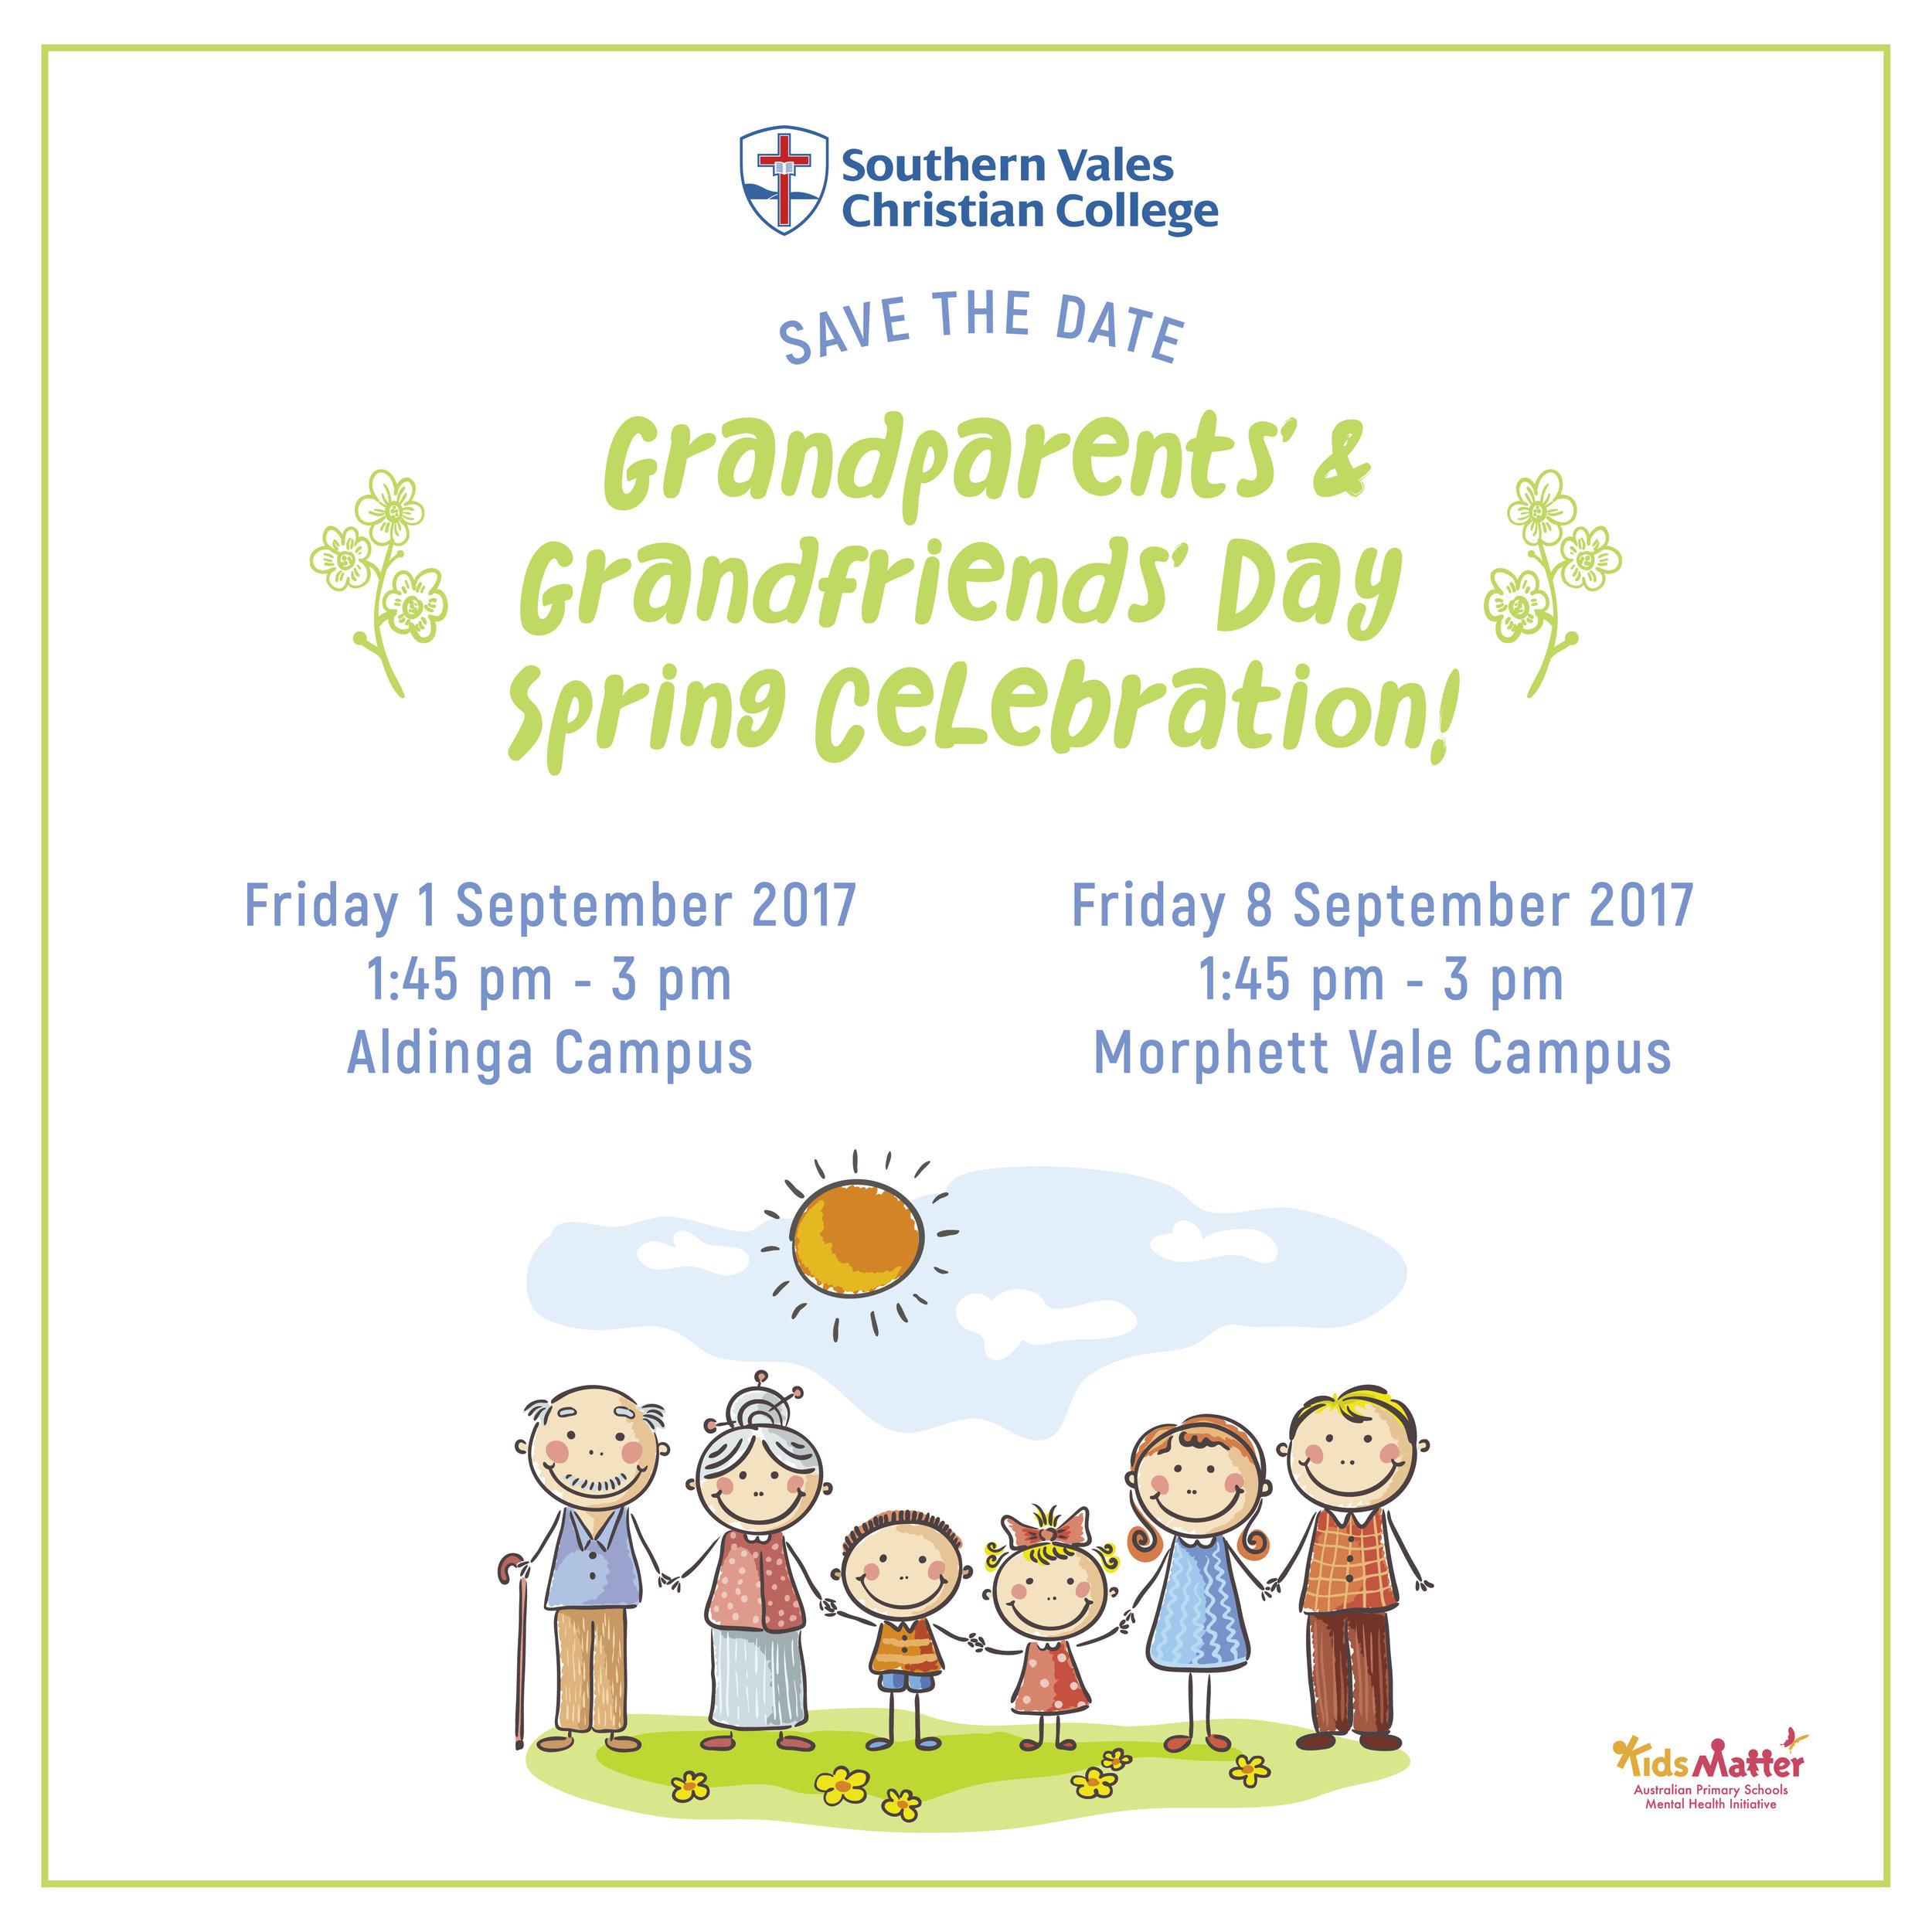 Grandparents & Grandfriends Day Instagram Ad.jpg